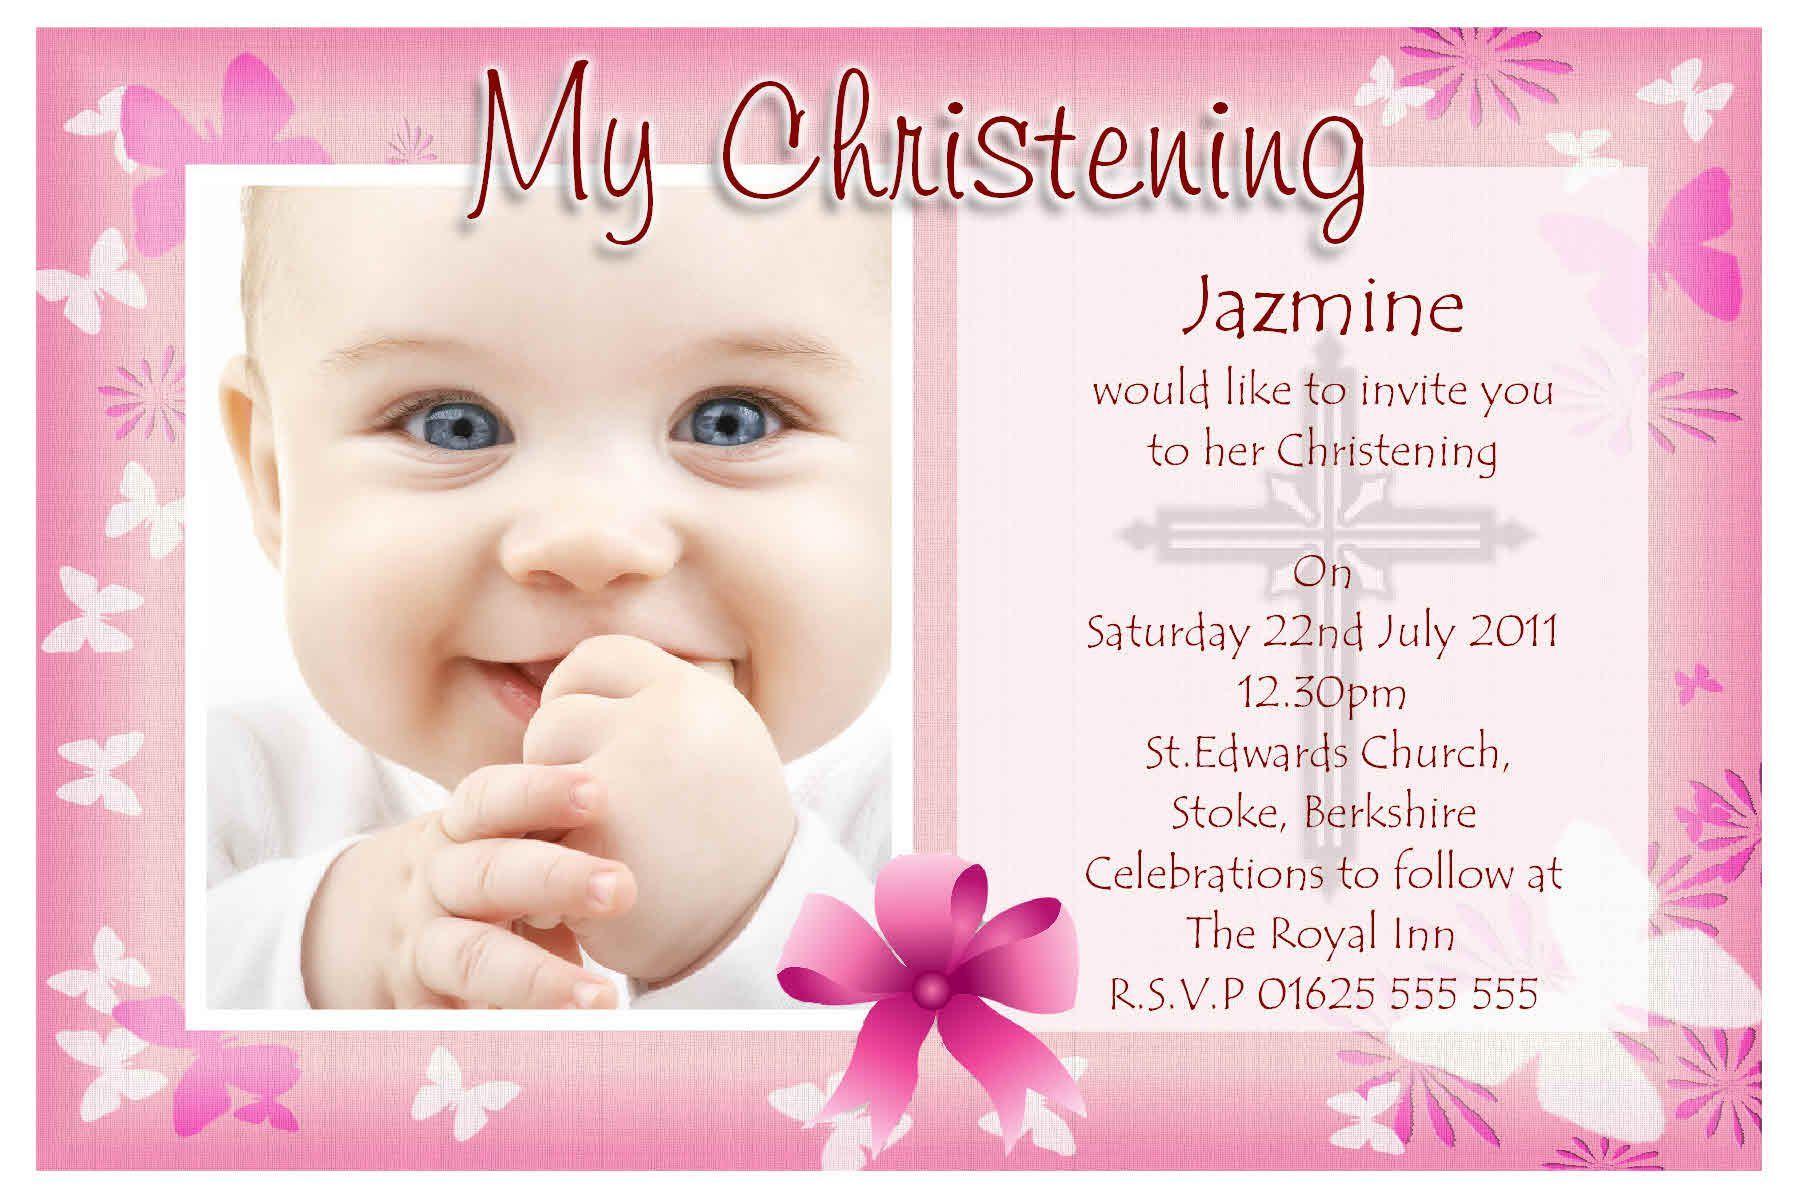 Baptism invitation card maker free baptism invitations pinterest baptism invitation card maker free stopboris Gallery